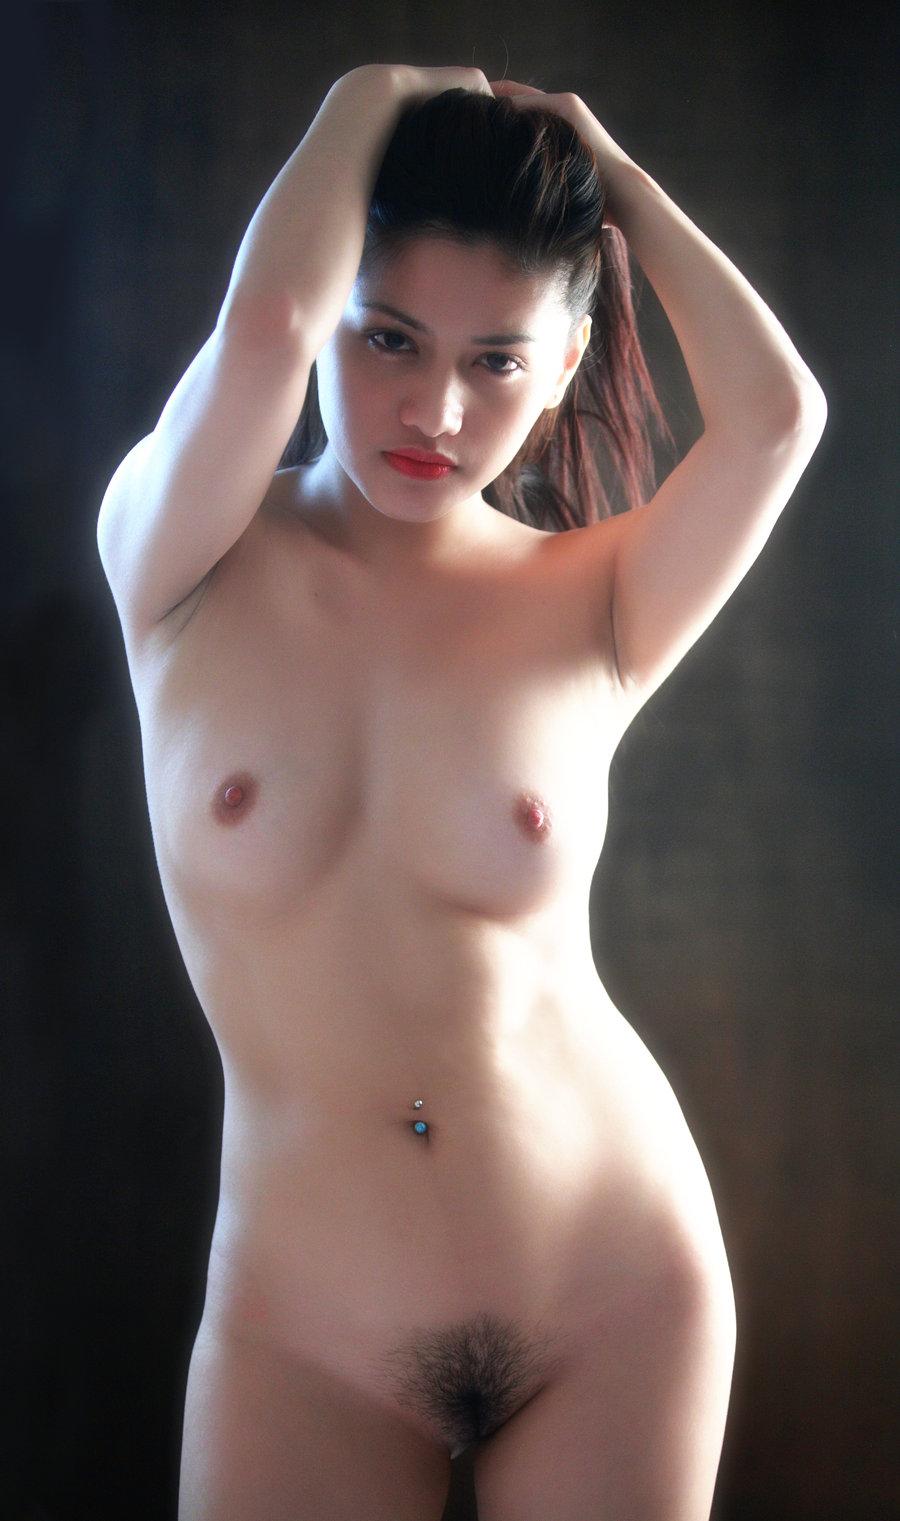 Pinay Nude Art Model